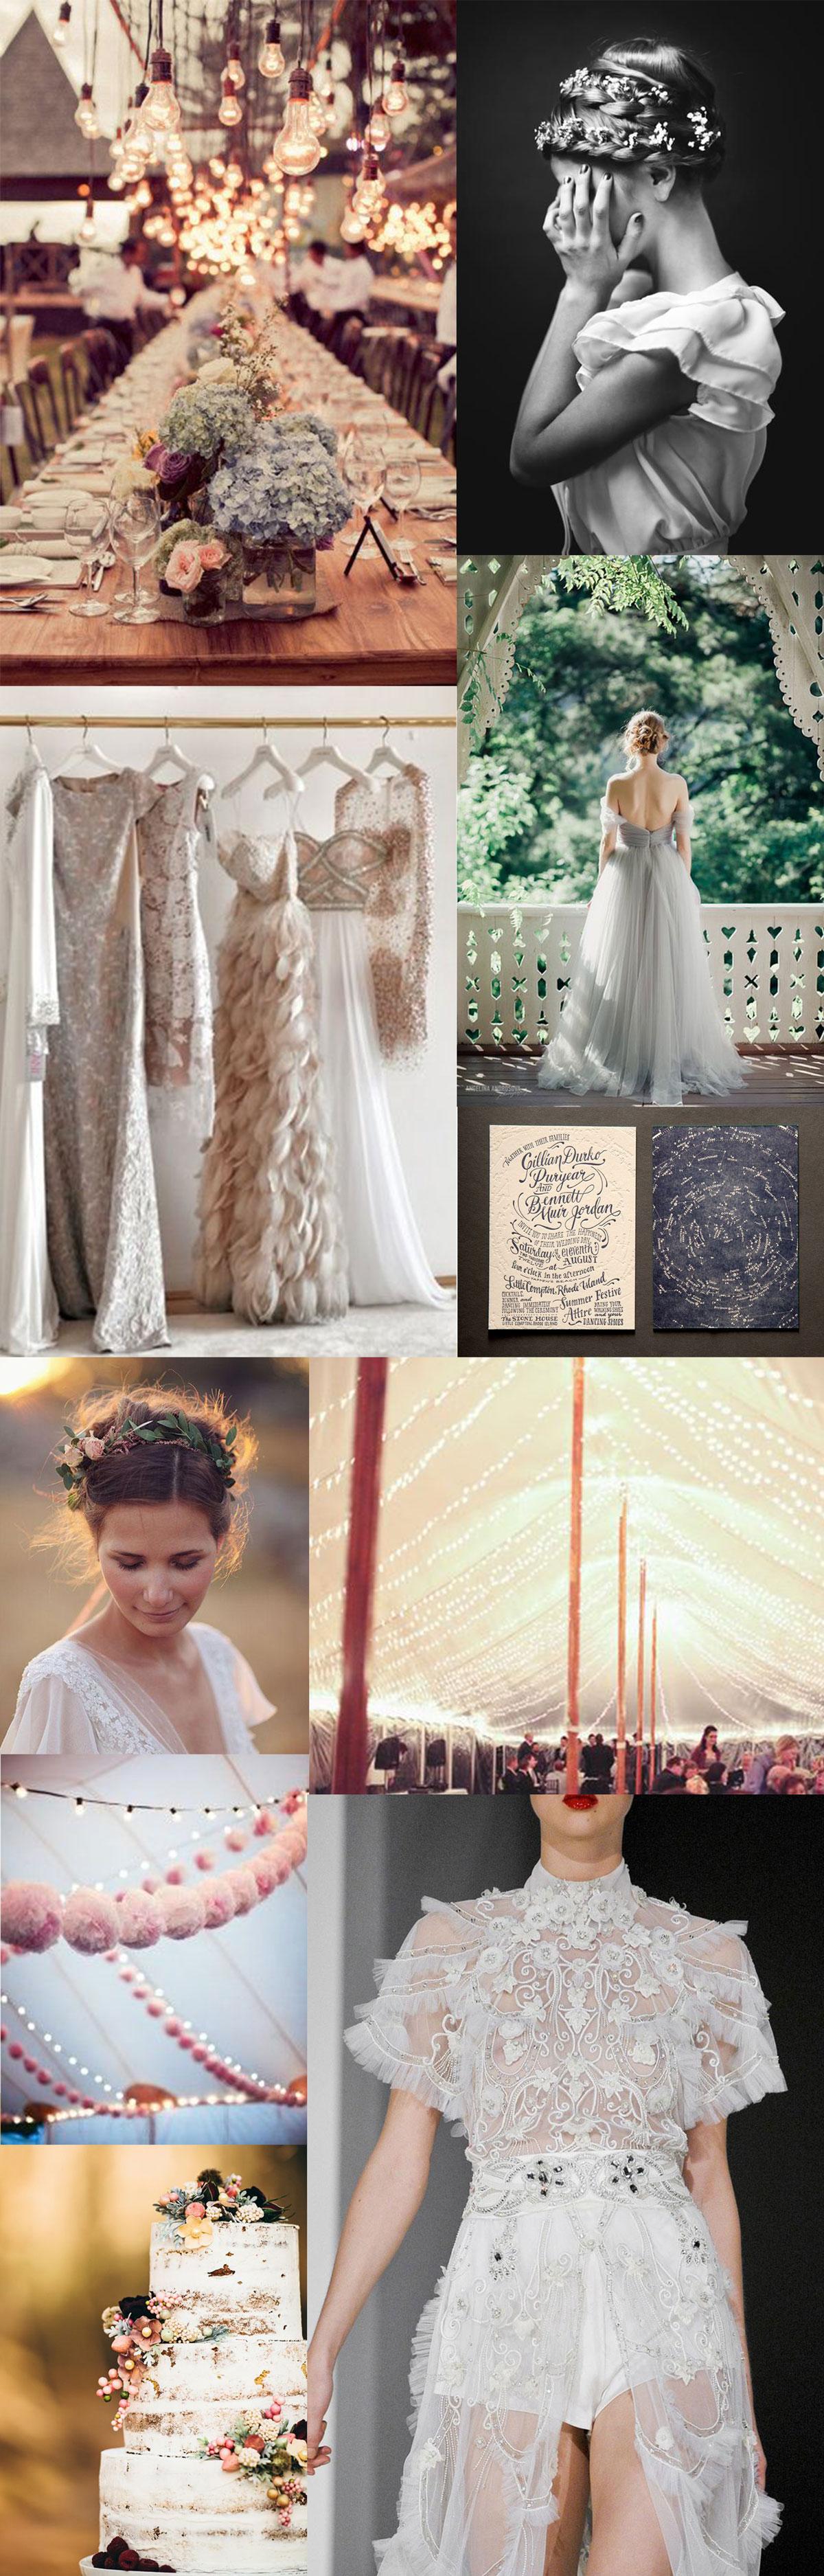 Wedding_inspo